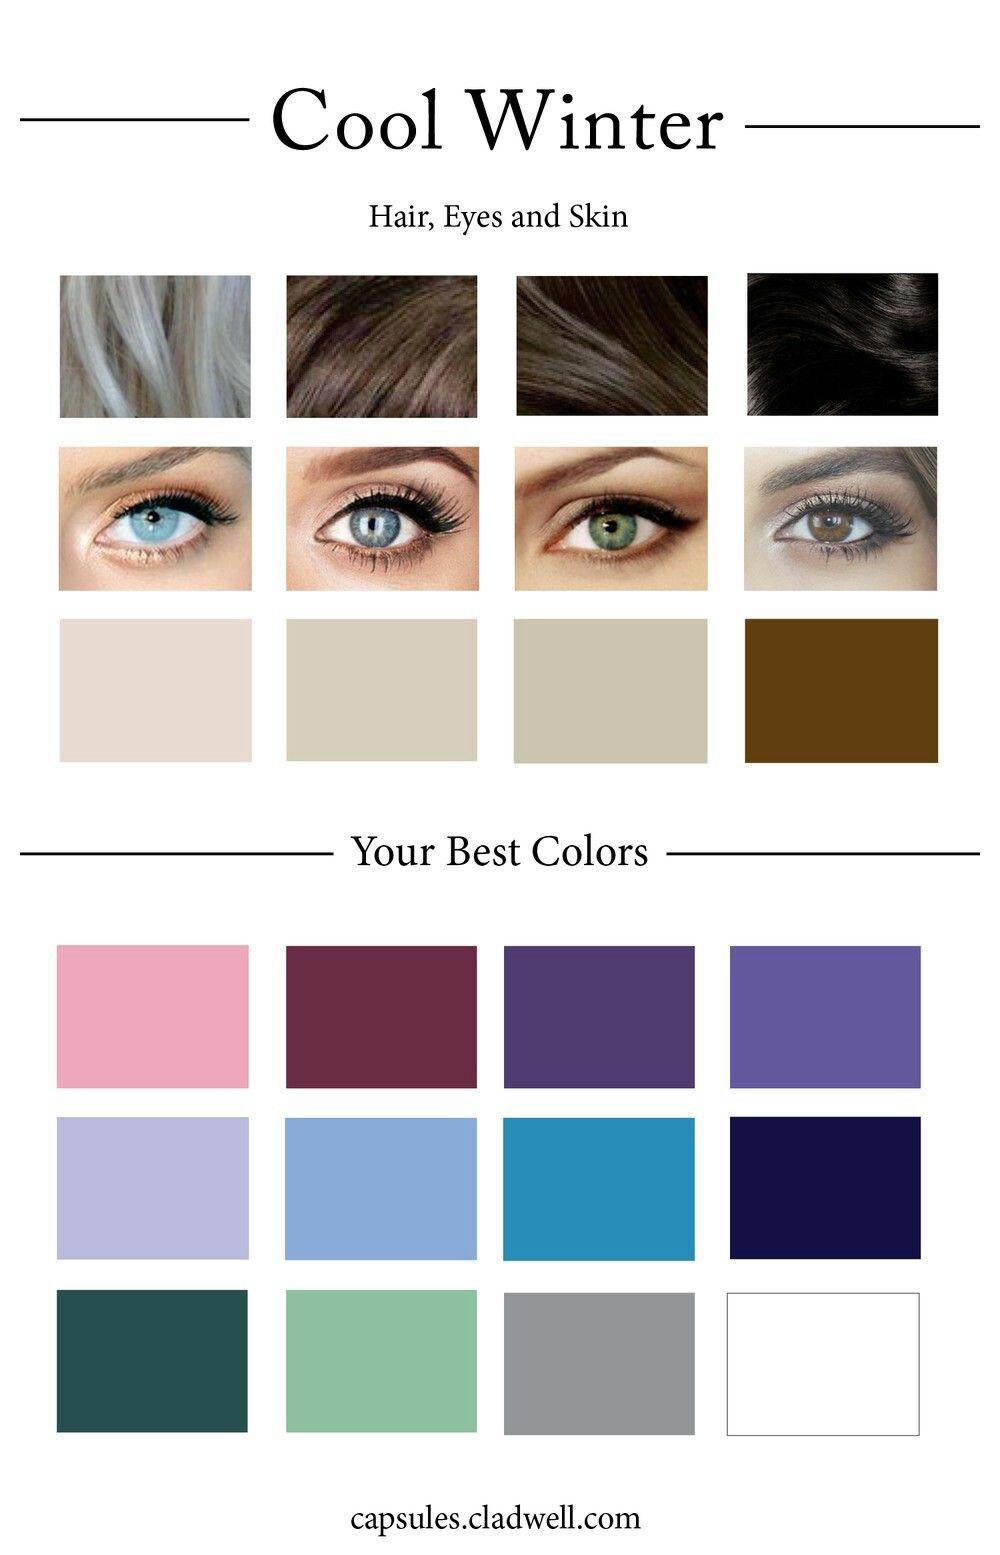 Cool Winter Palette With Hair Eyes And Skin Examples Brown Hair Blue Eyes Winter Skin Tone Hair Pale Skin